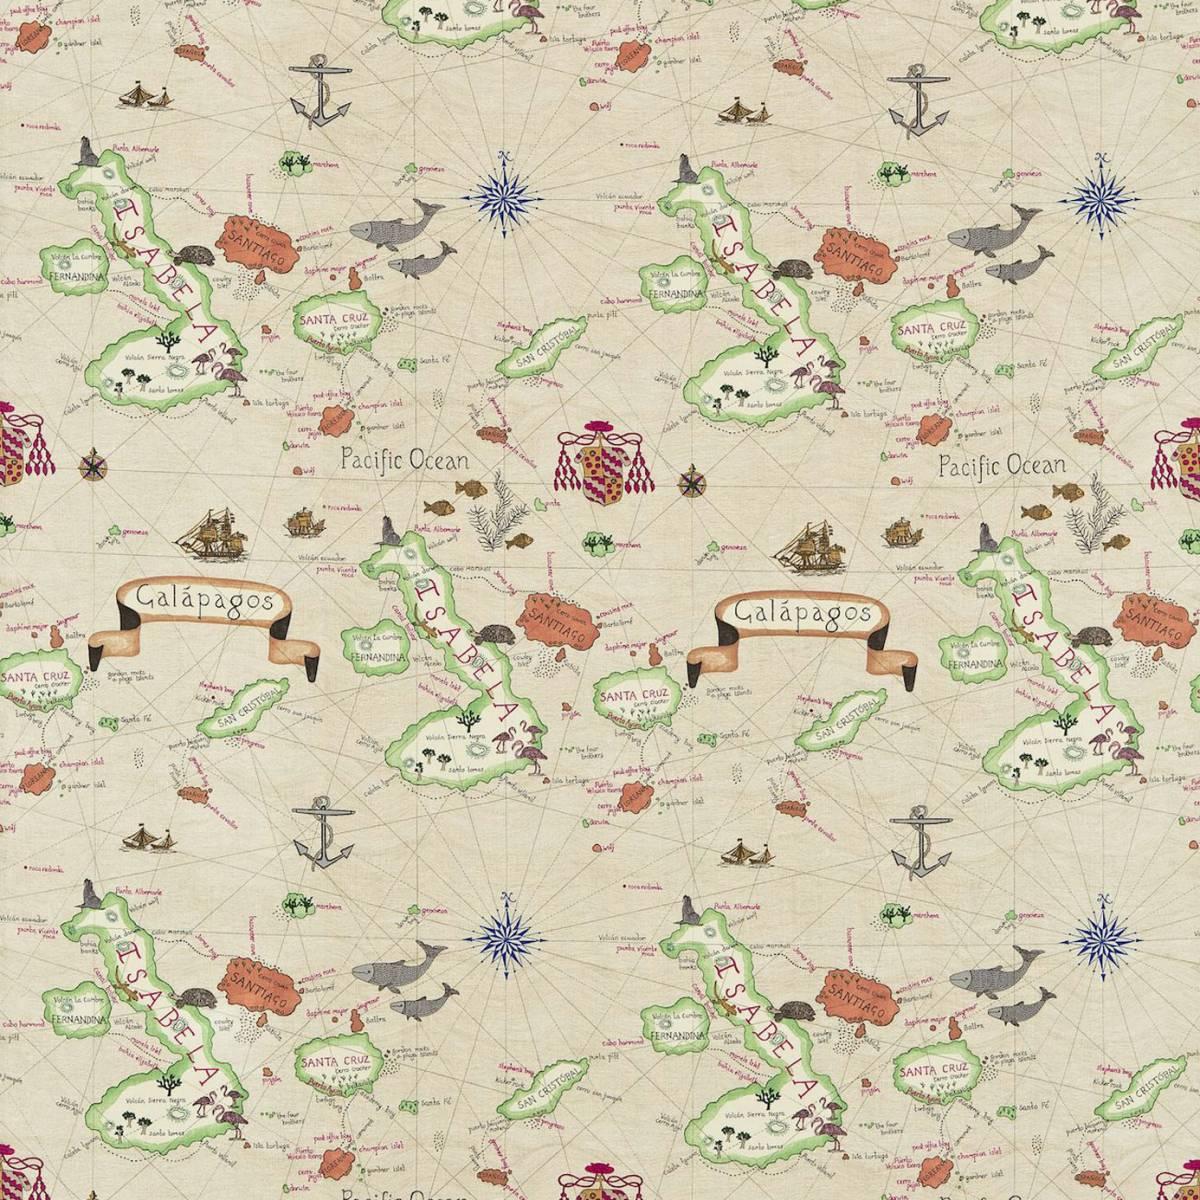 galapagos fabric parchment 223275 sanderson voyage. Black Bedroom Furniture Sets. Home Design Ideas